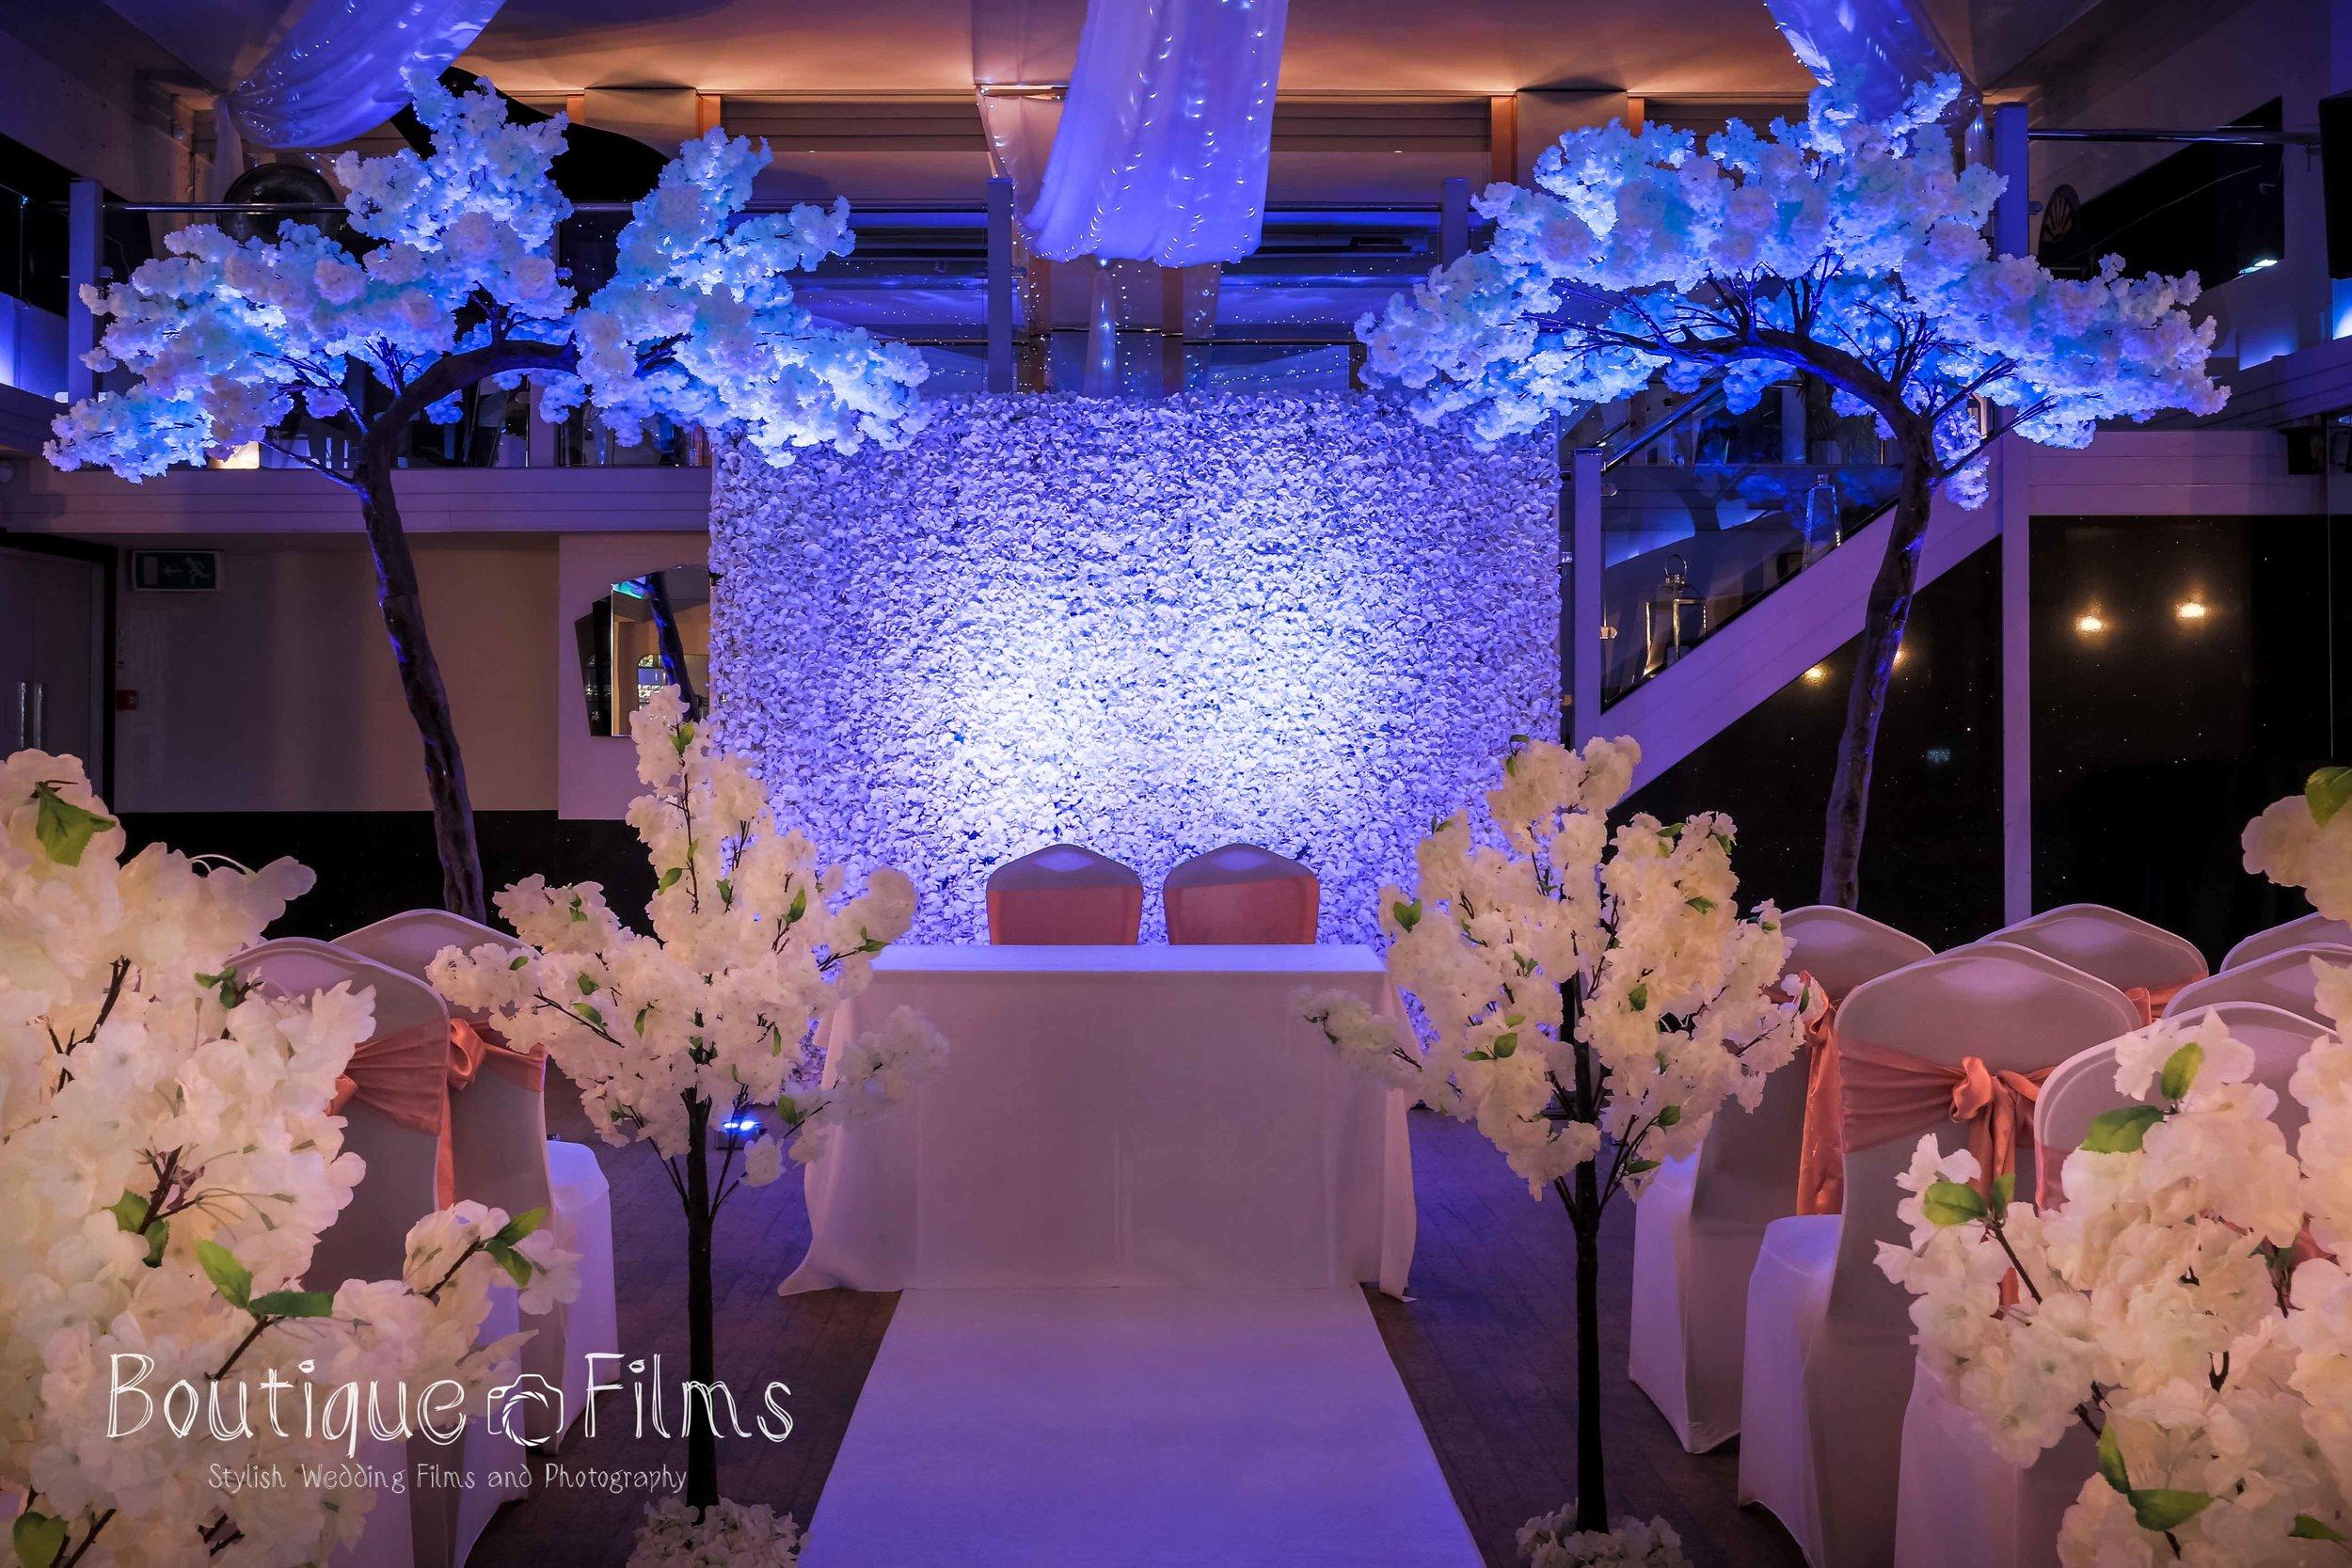 Humanist Wedding Ceremony at The Arlington Ballroom, Southend-on-Sea